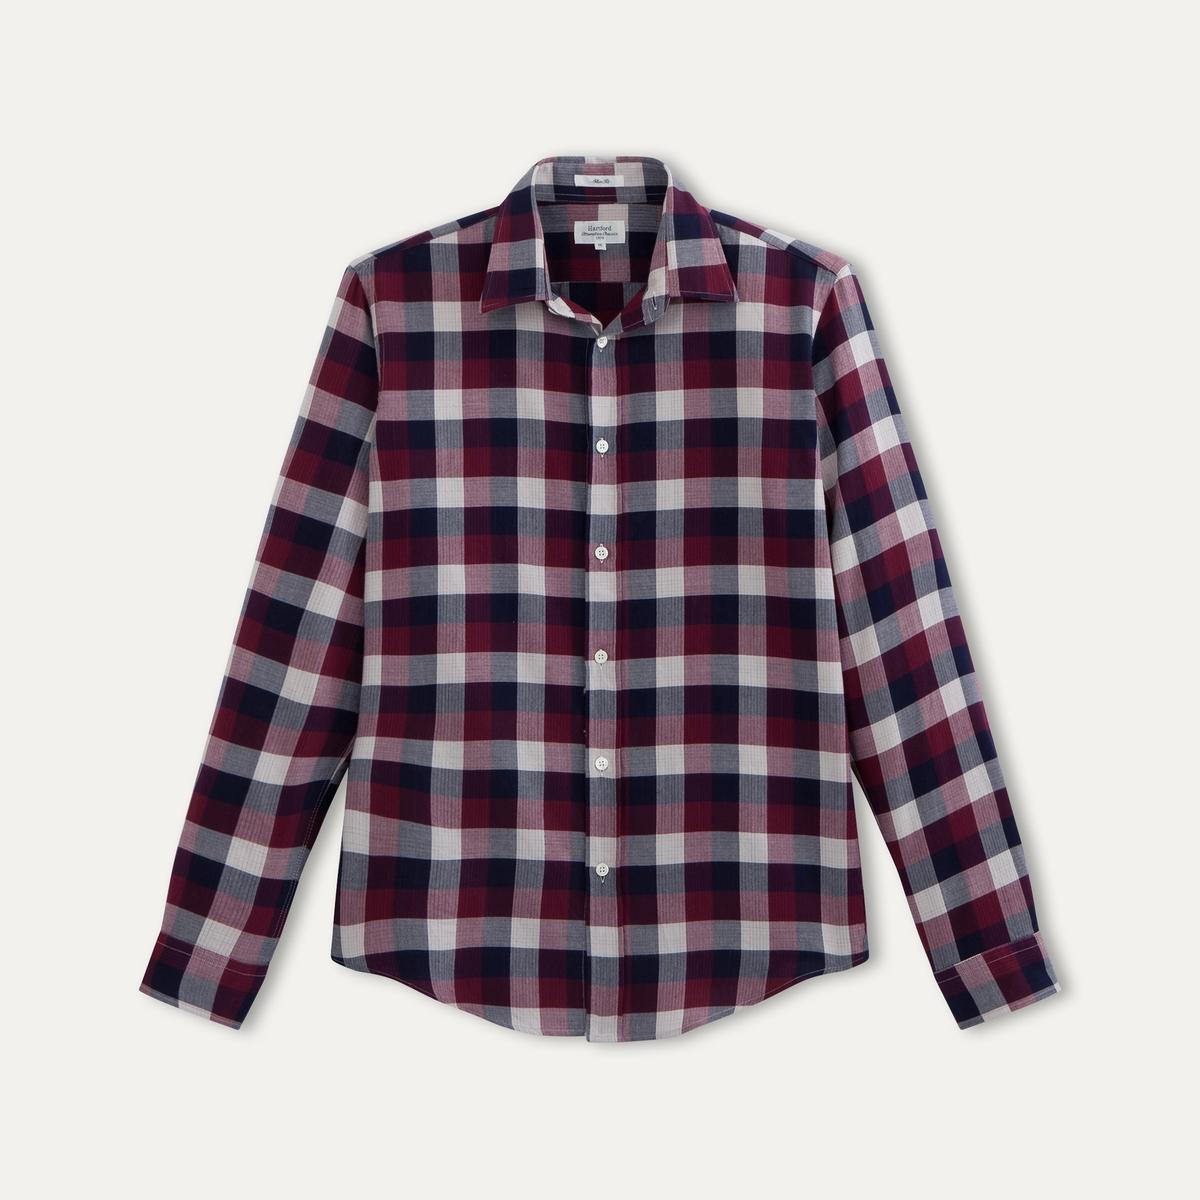 Рубашка в клетку от La Redoute